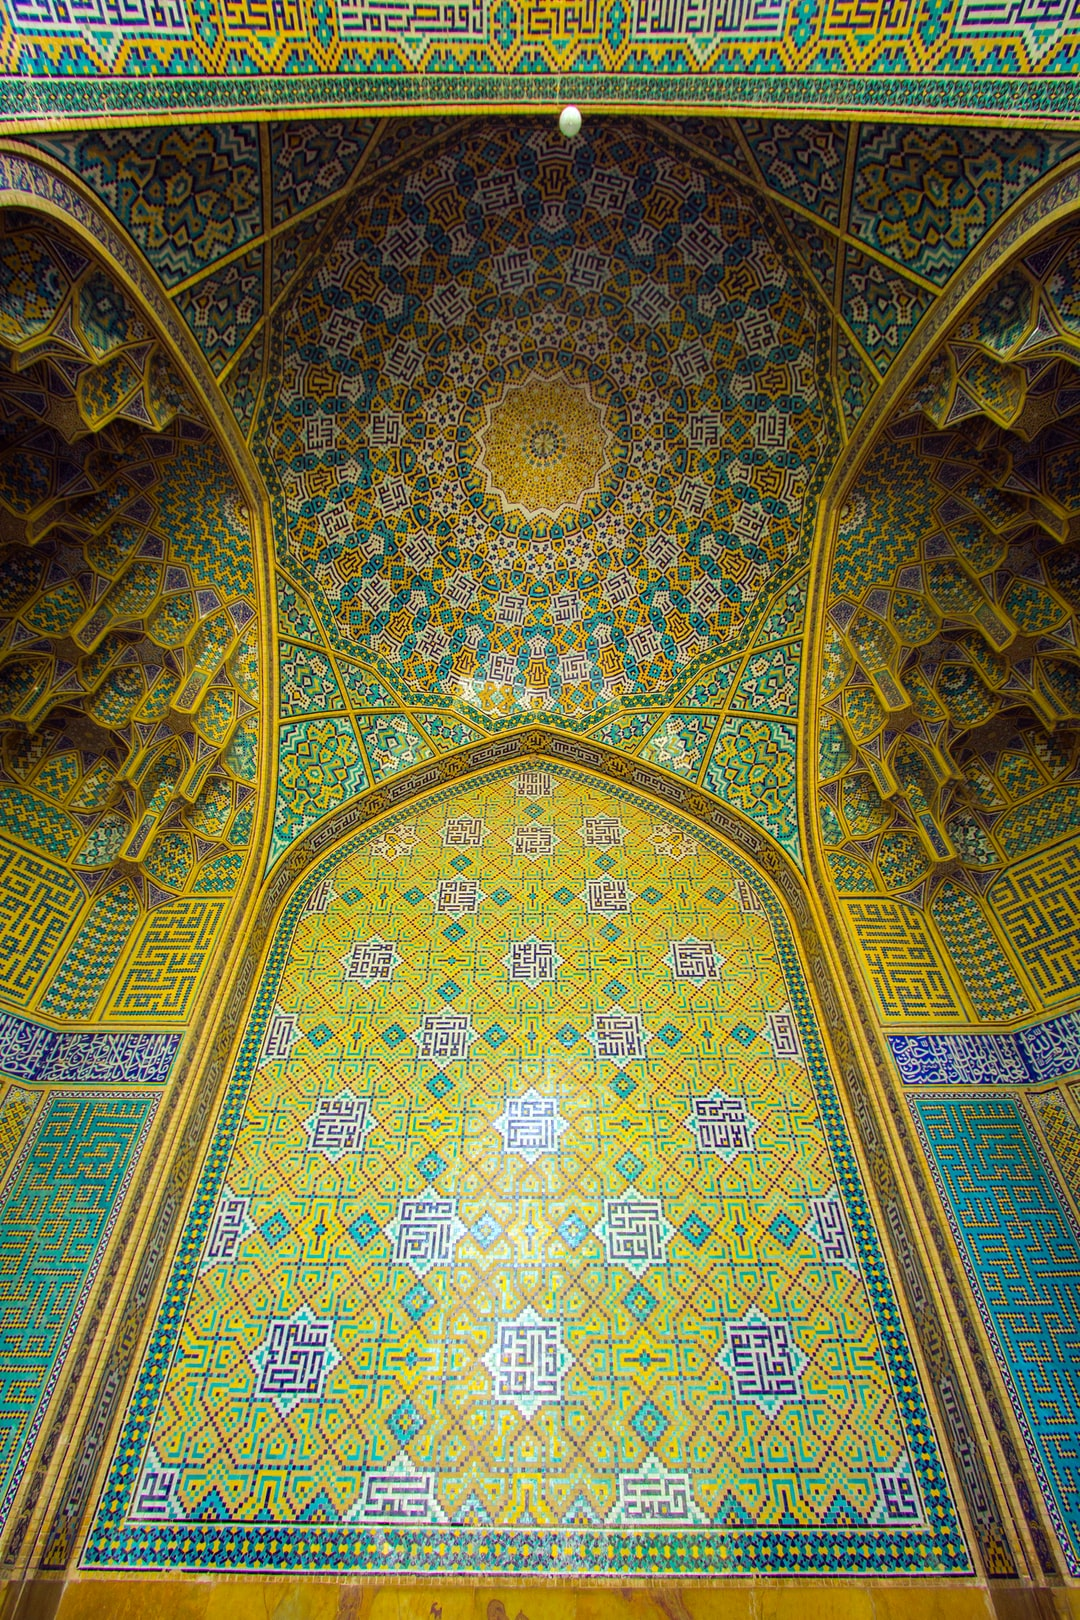 Chahār Bāgh school also known as Shah school, is a 17-18th century cultural complex in Isfahan, Iran.